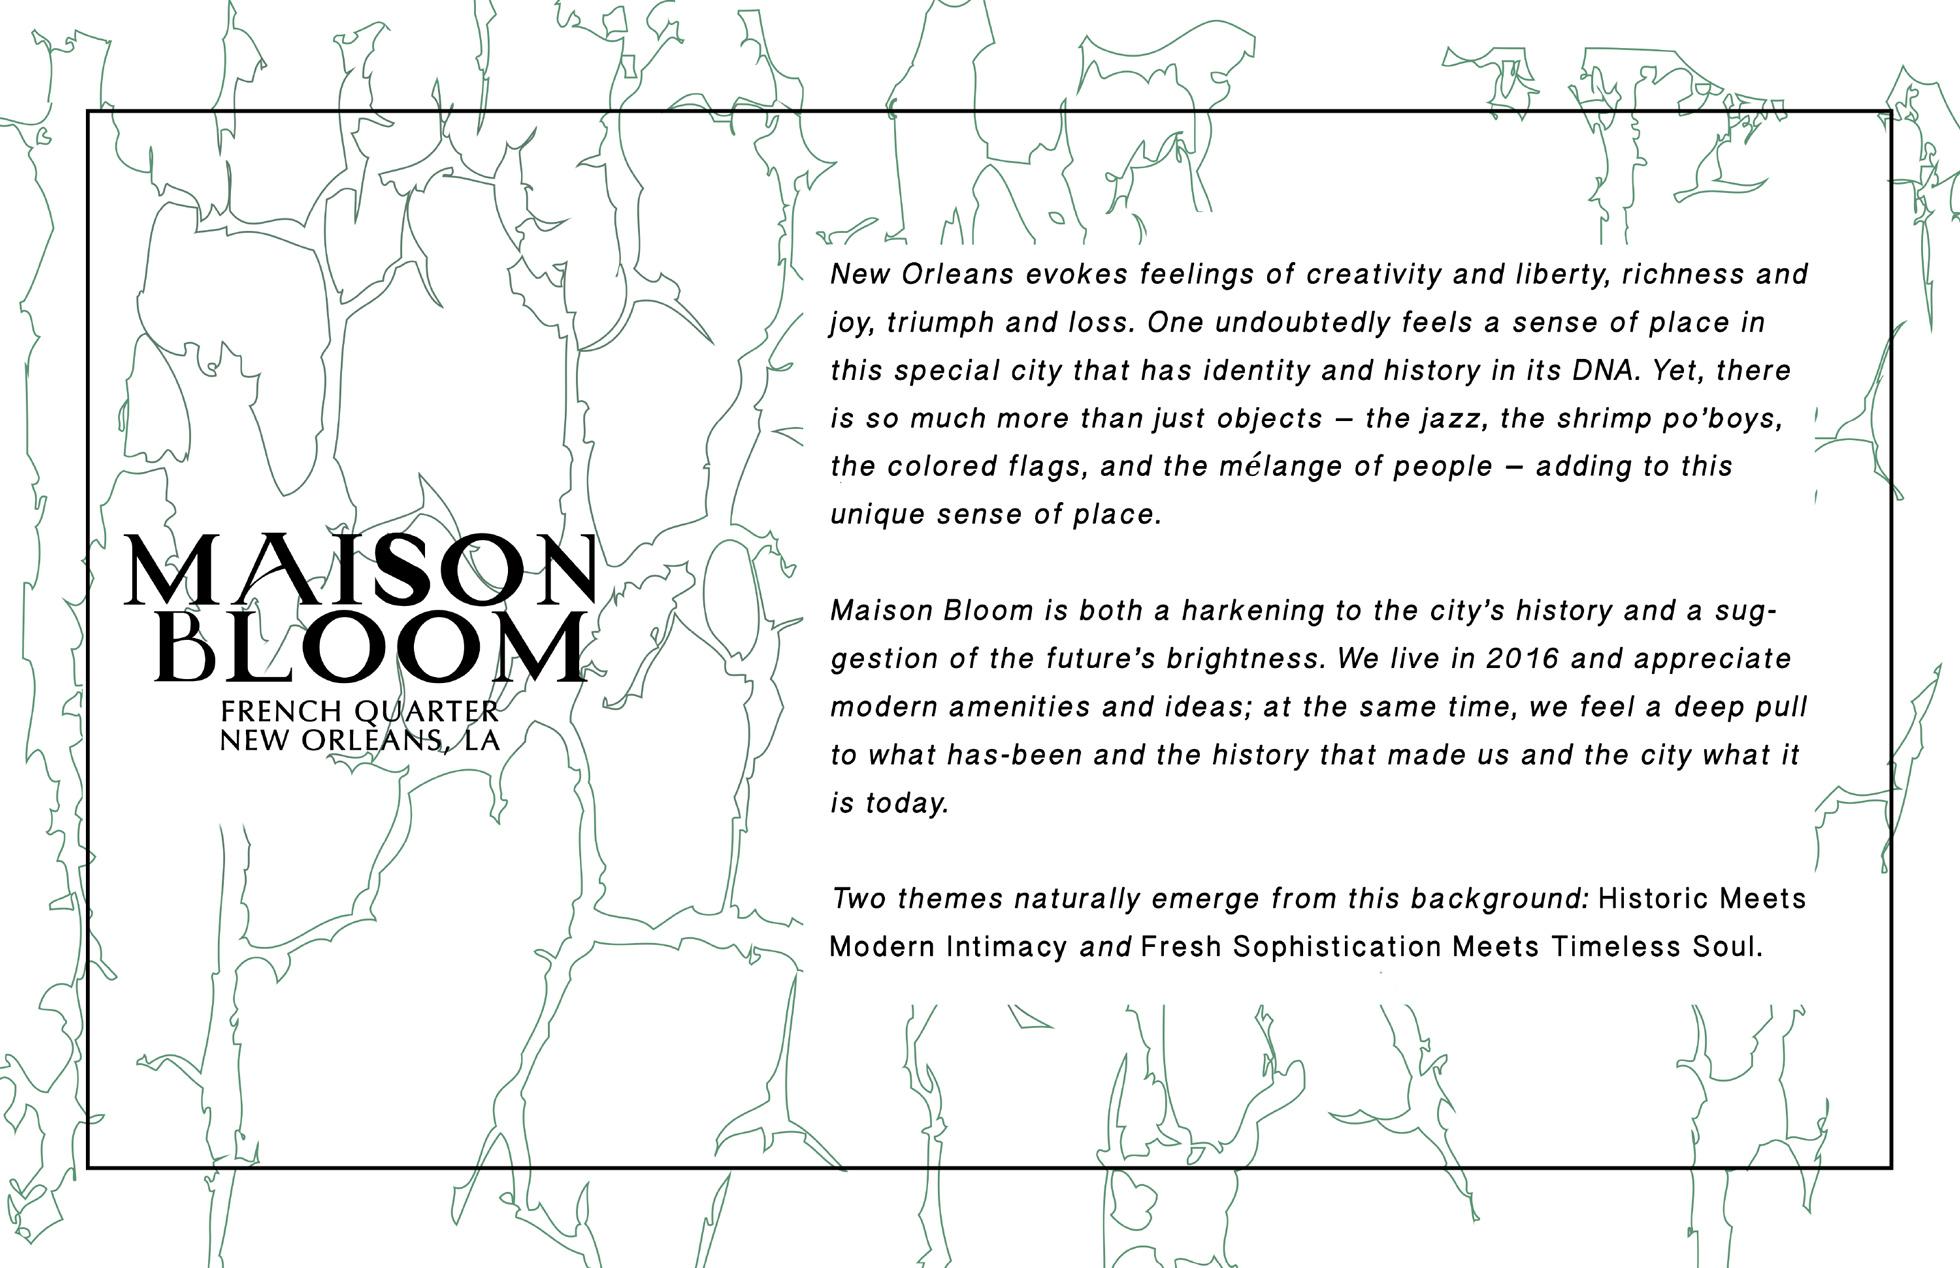 MAISON-BLOOM-3.1